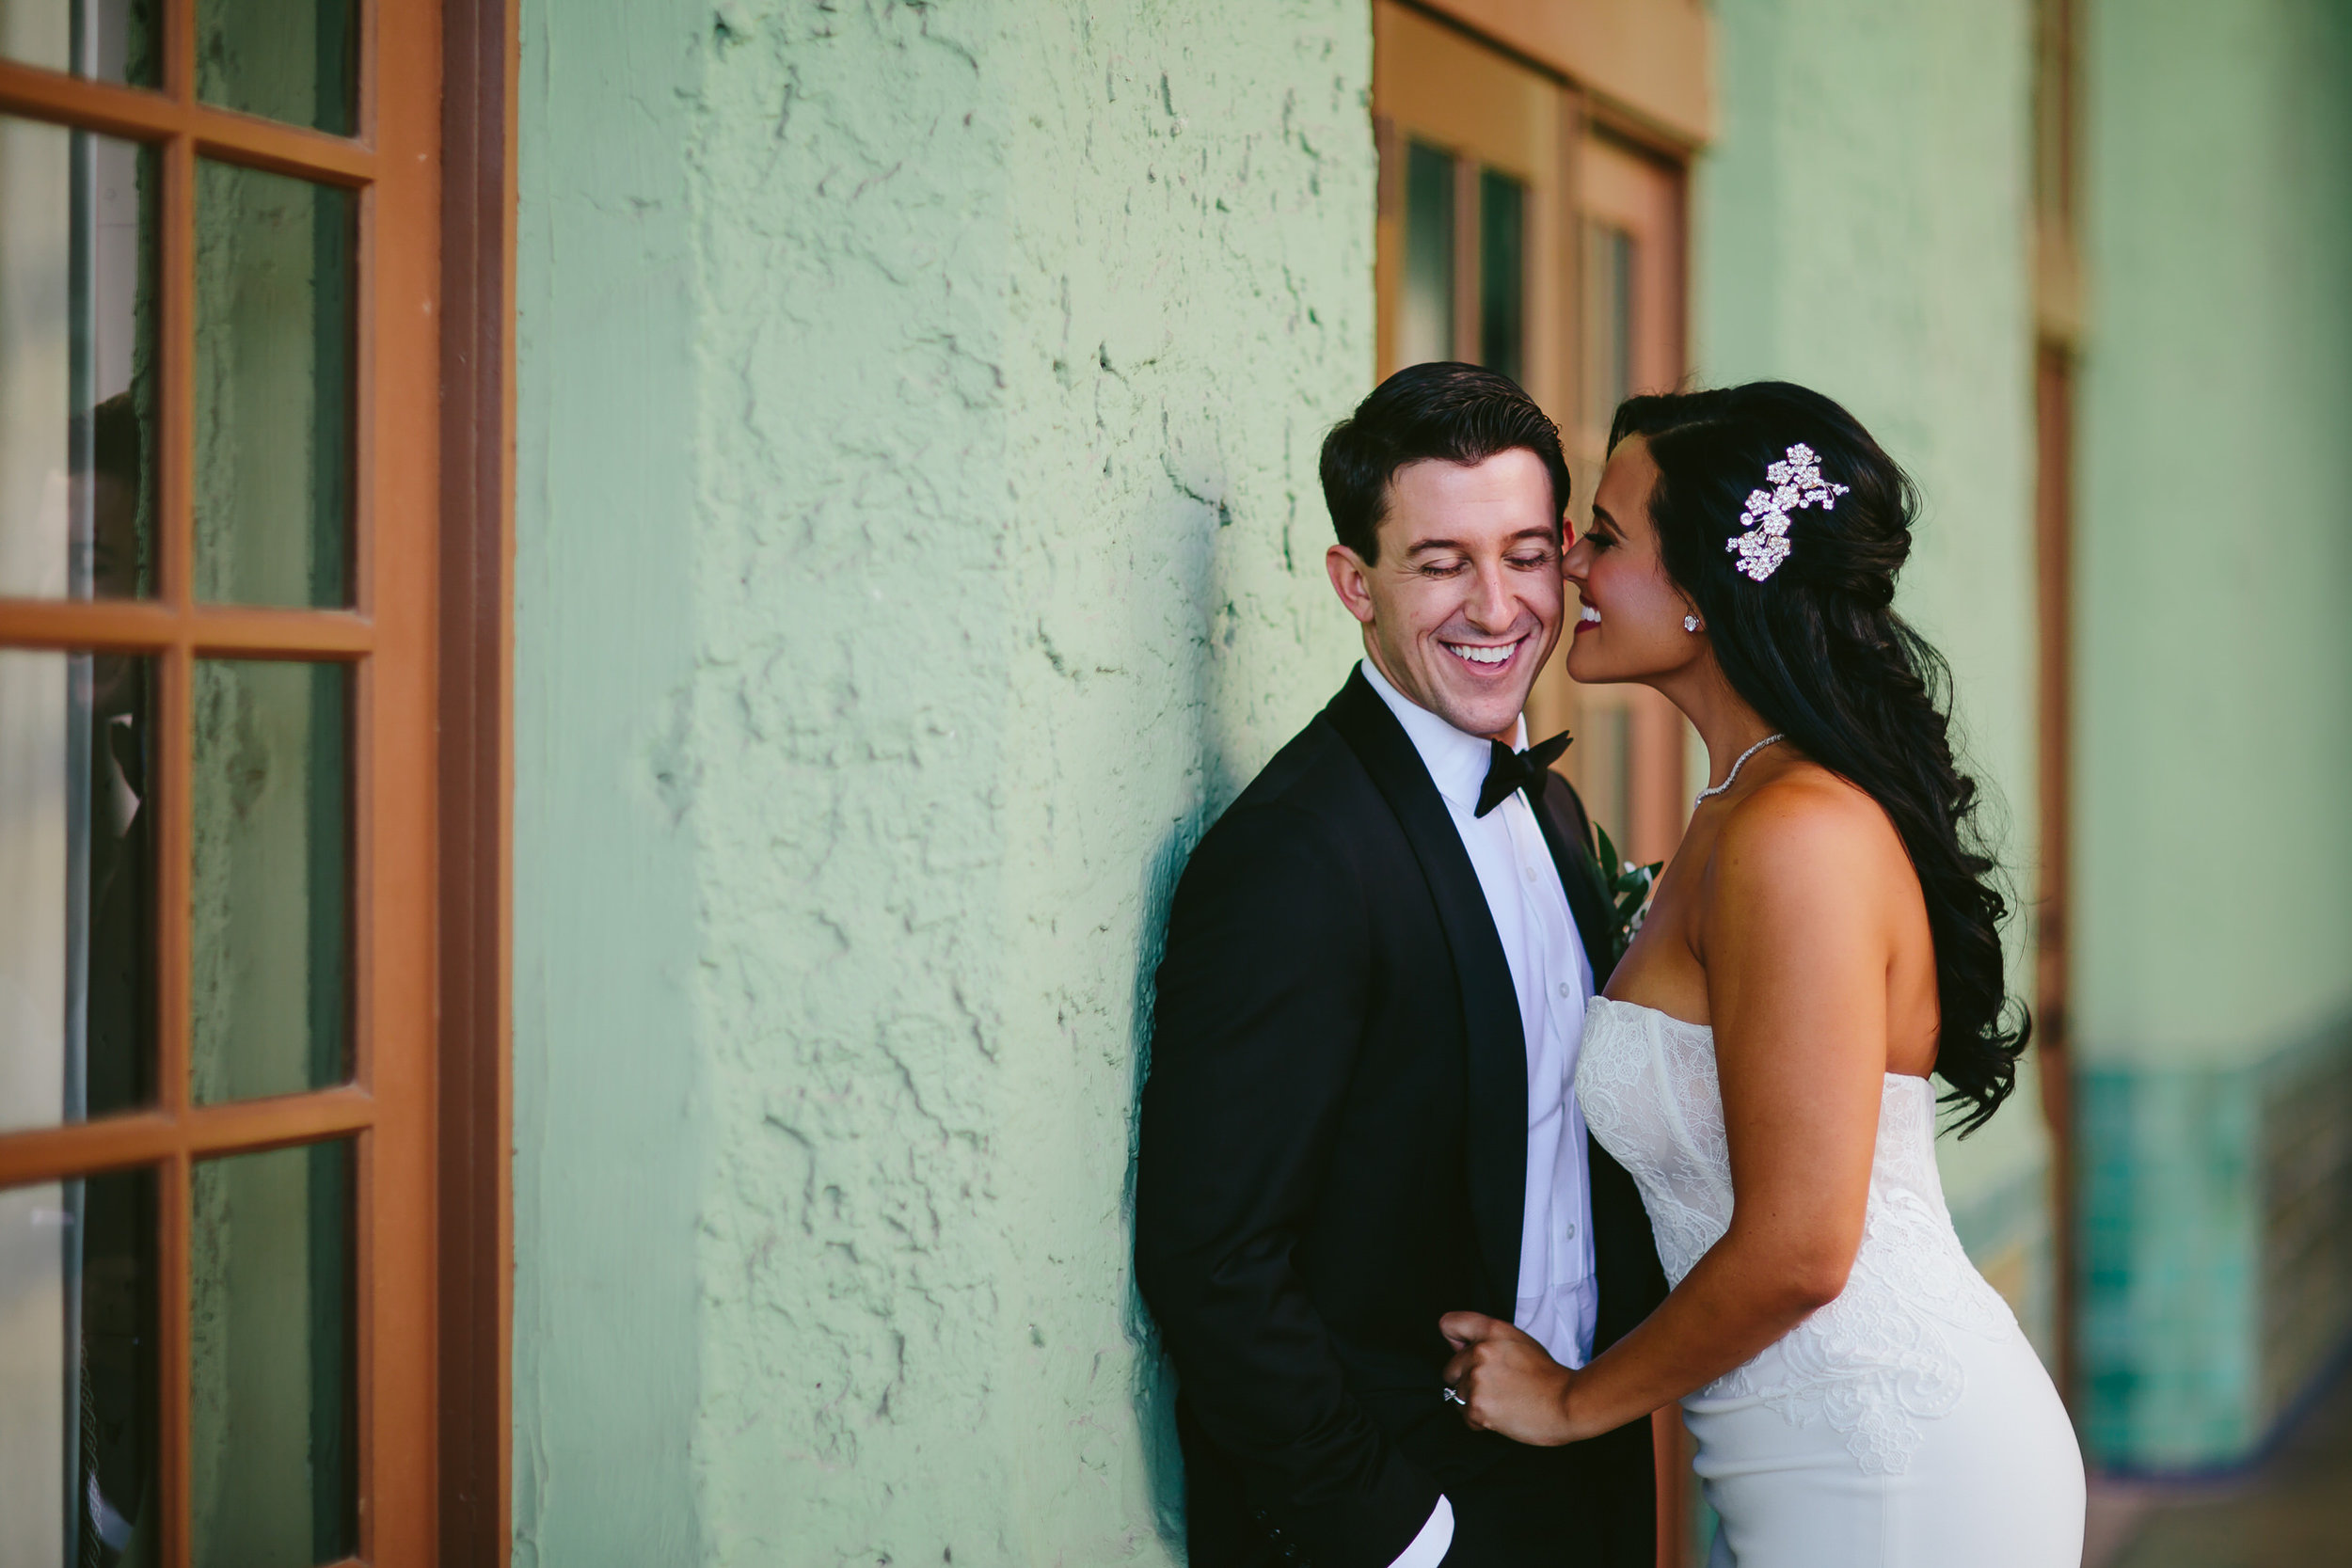 biltmore-wedding-steph-lynn-photo-photographer-bride-and-groom-11.jpg